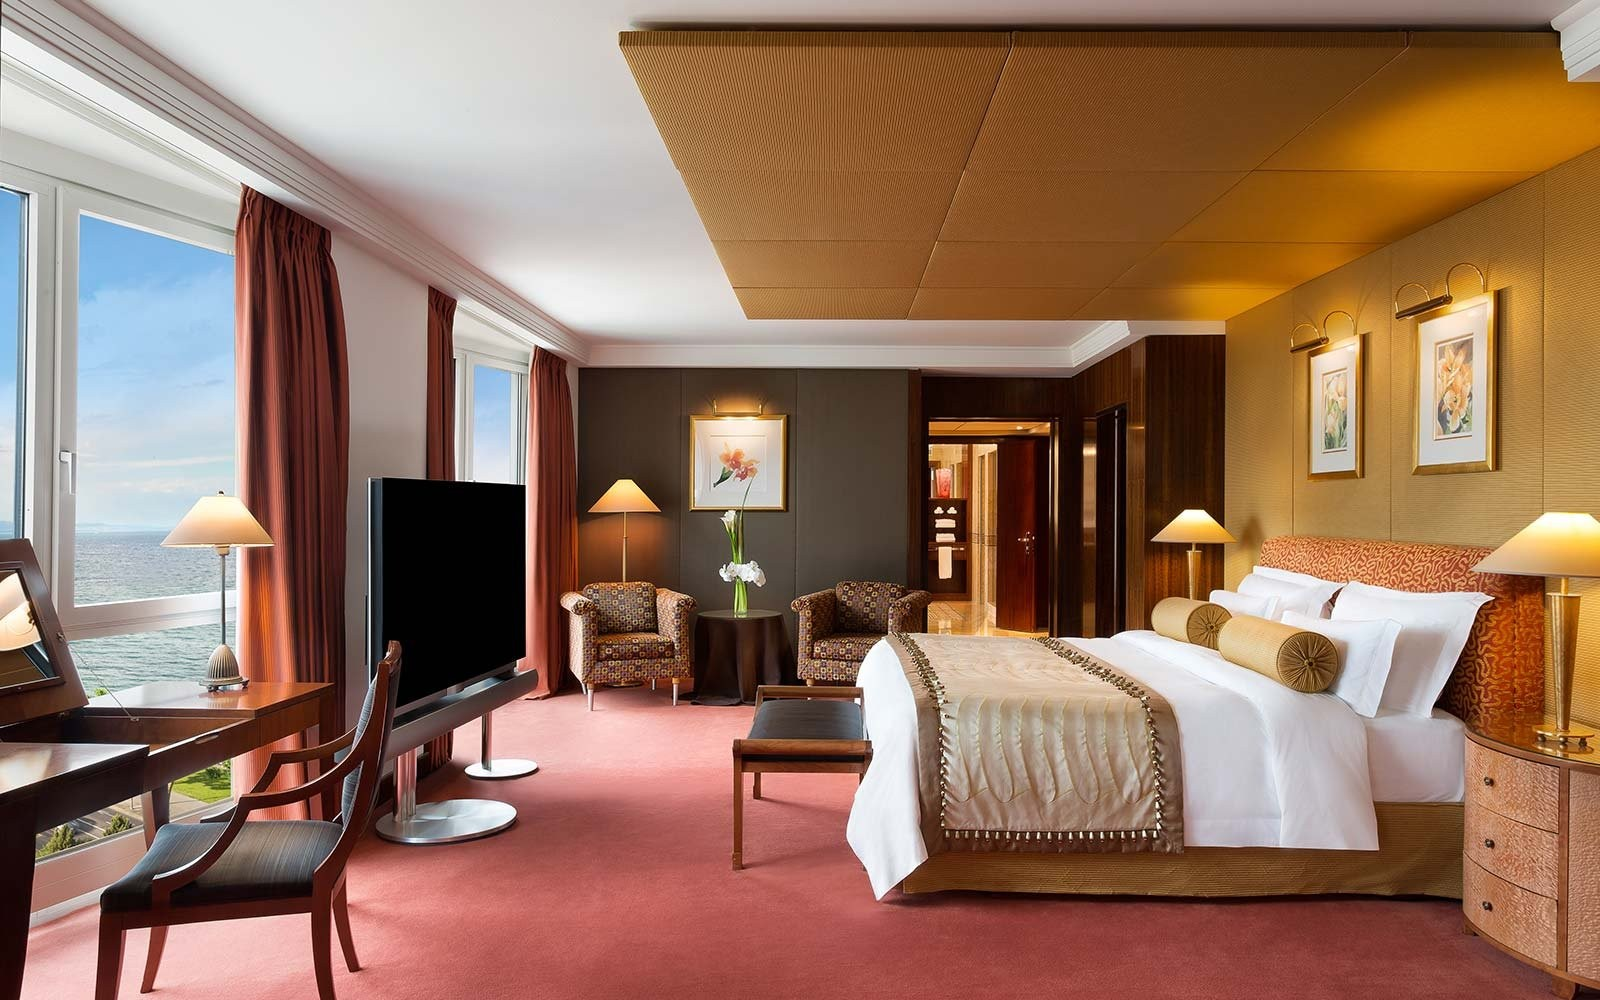 guest-room-hotel-president-wilson-geneva-expensivesuite1017